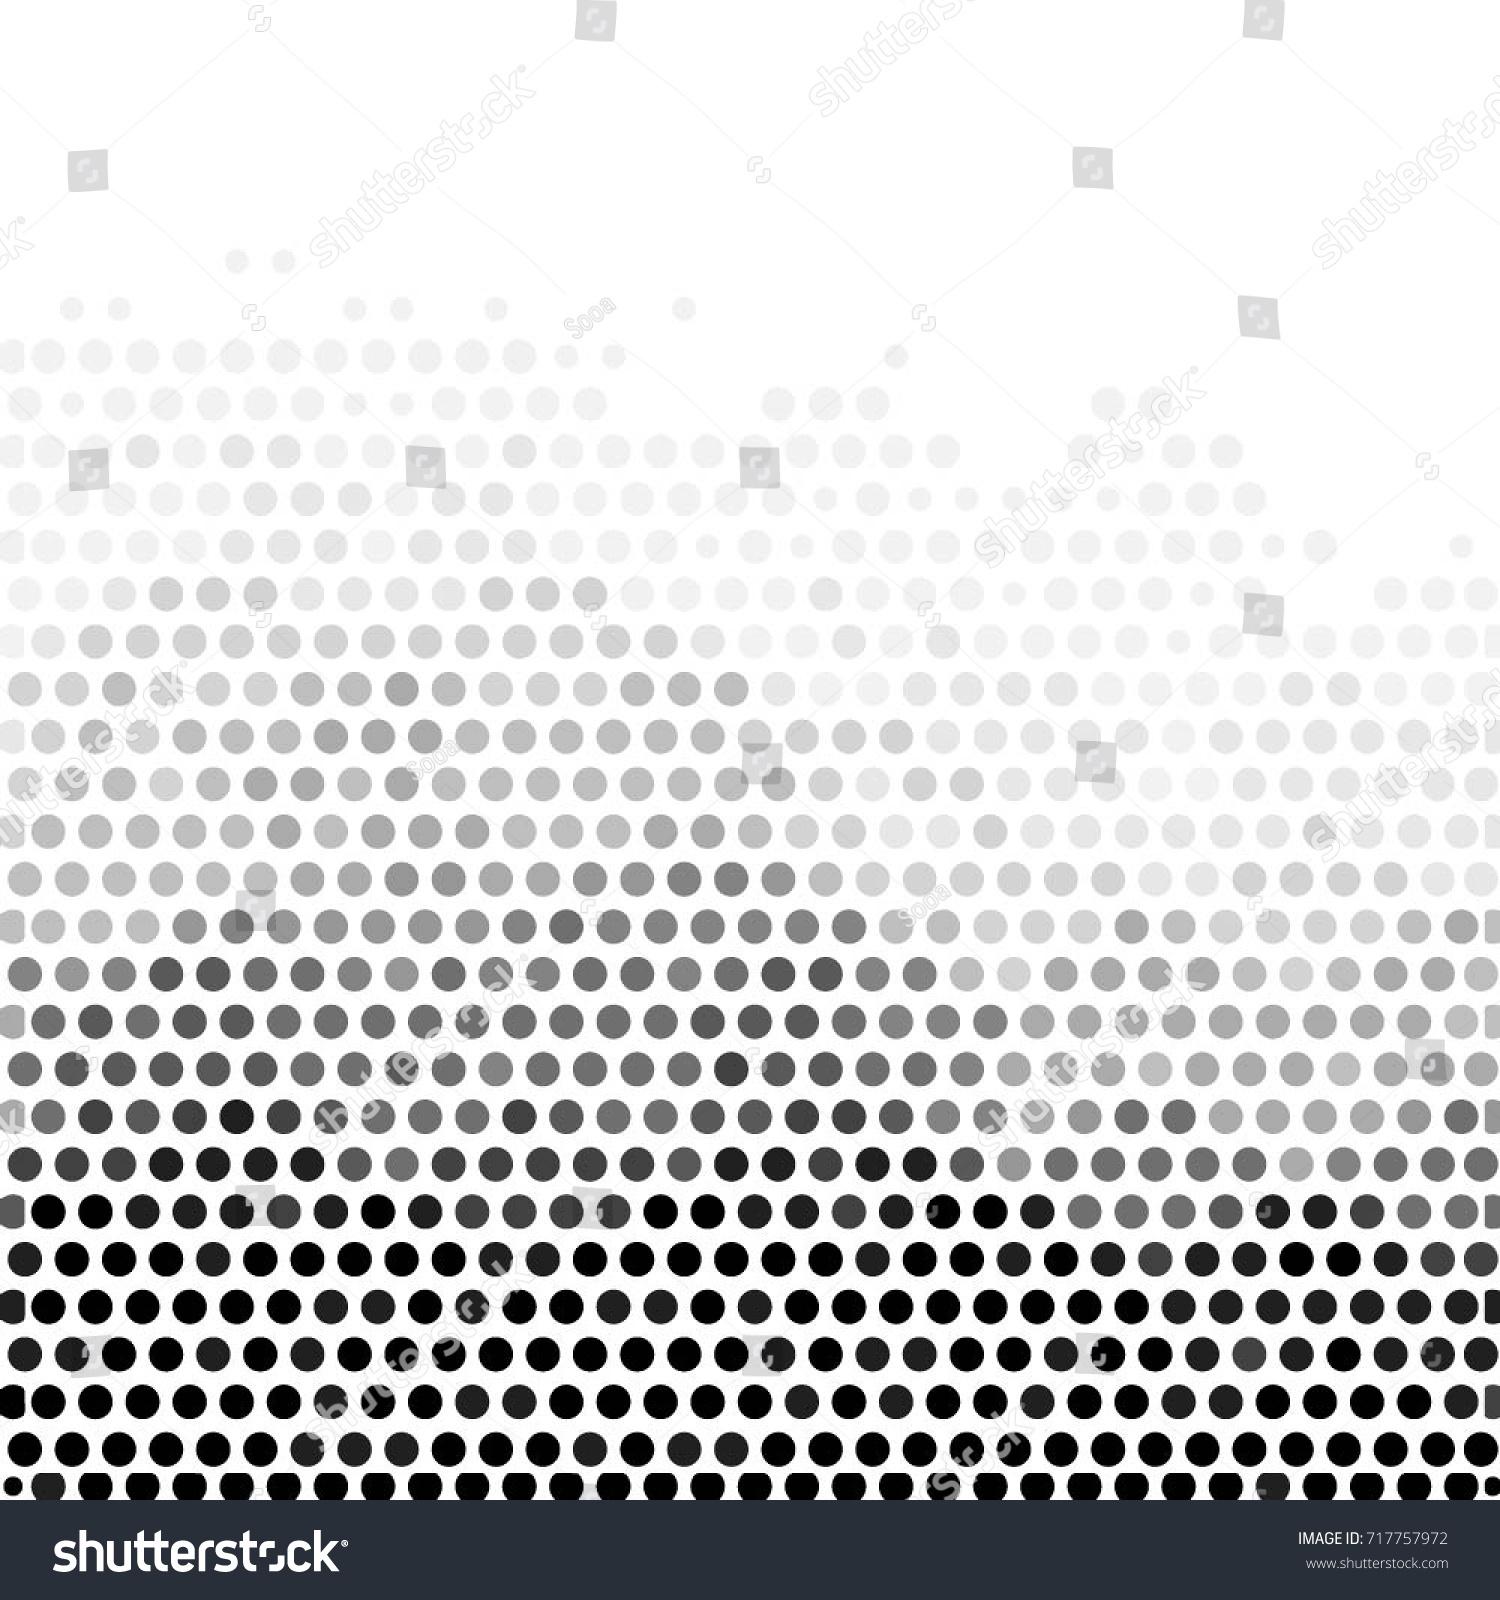 Dot Grid Template dot paper template download penutlimate ppr – Dot Paper Template